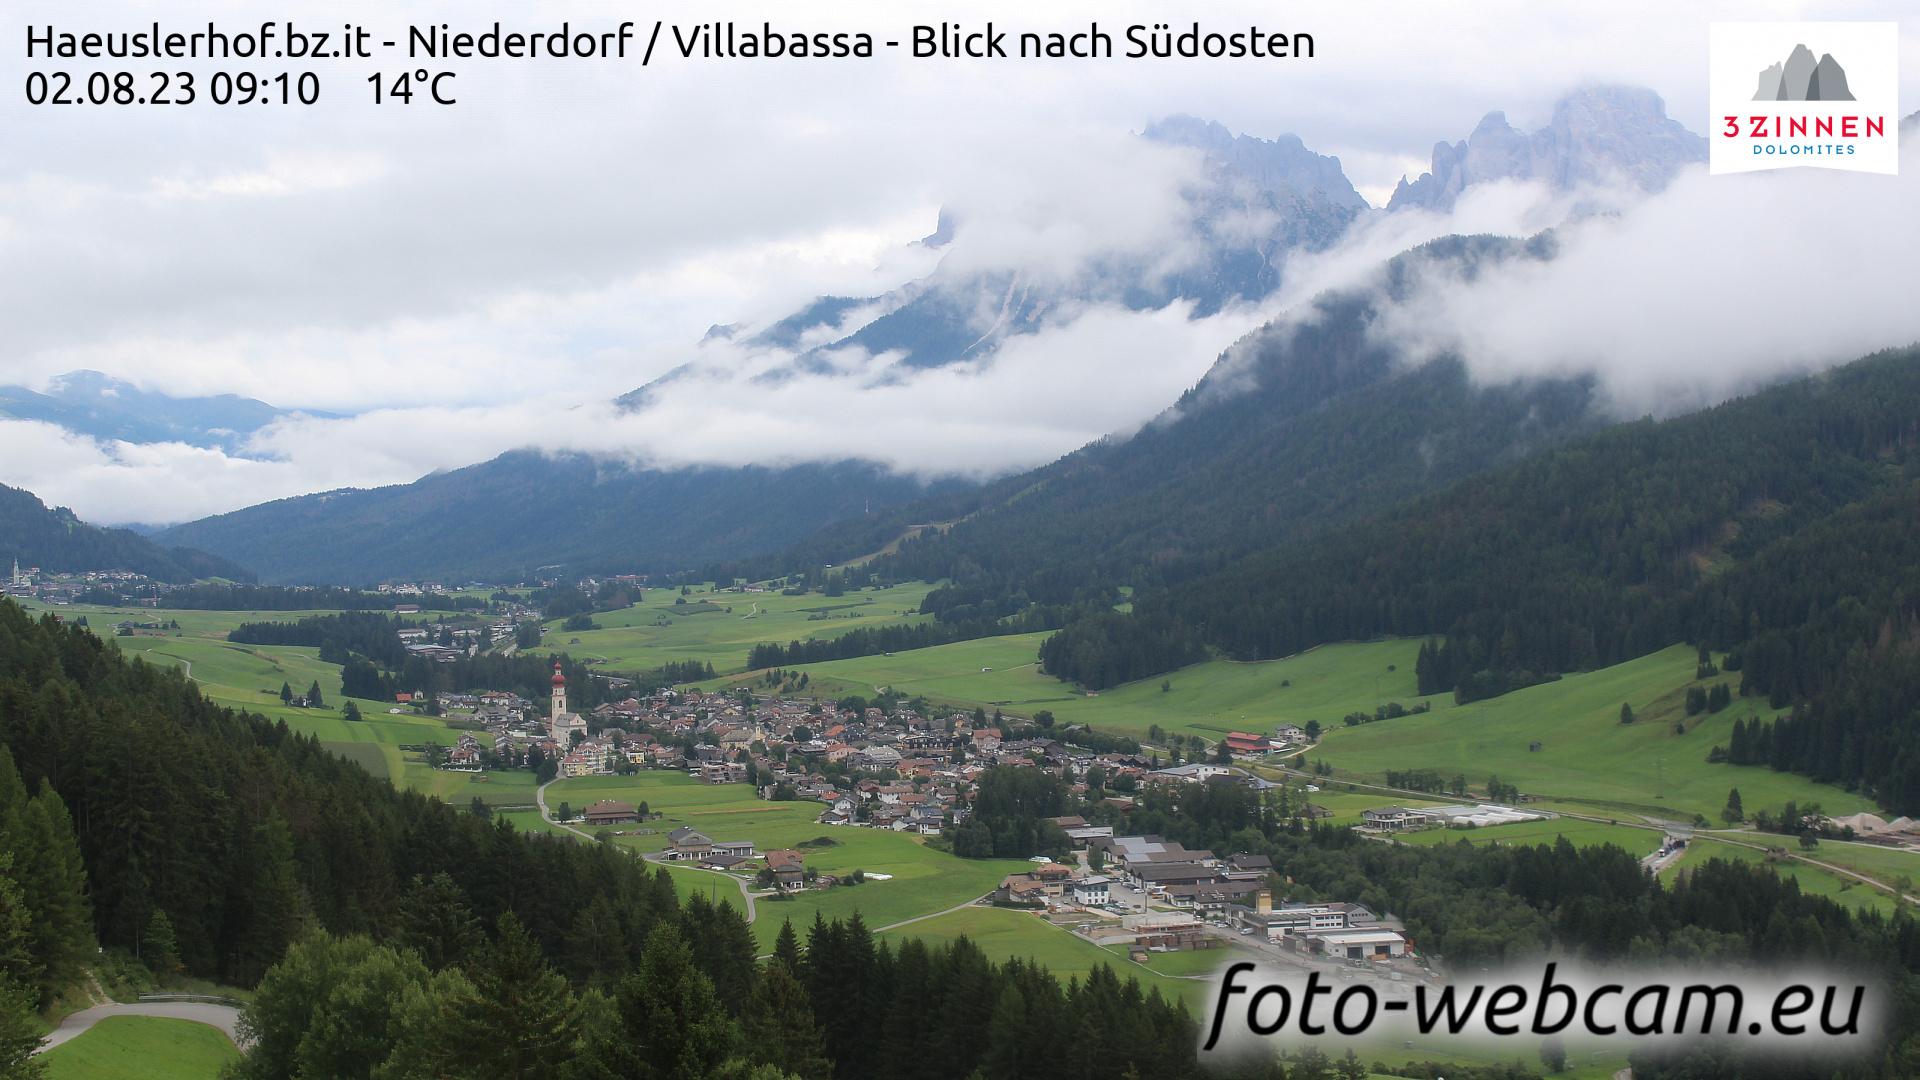 Niederdorf Wed. 09:27